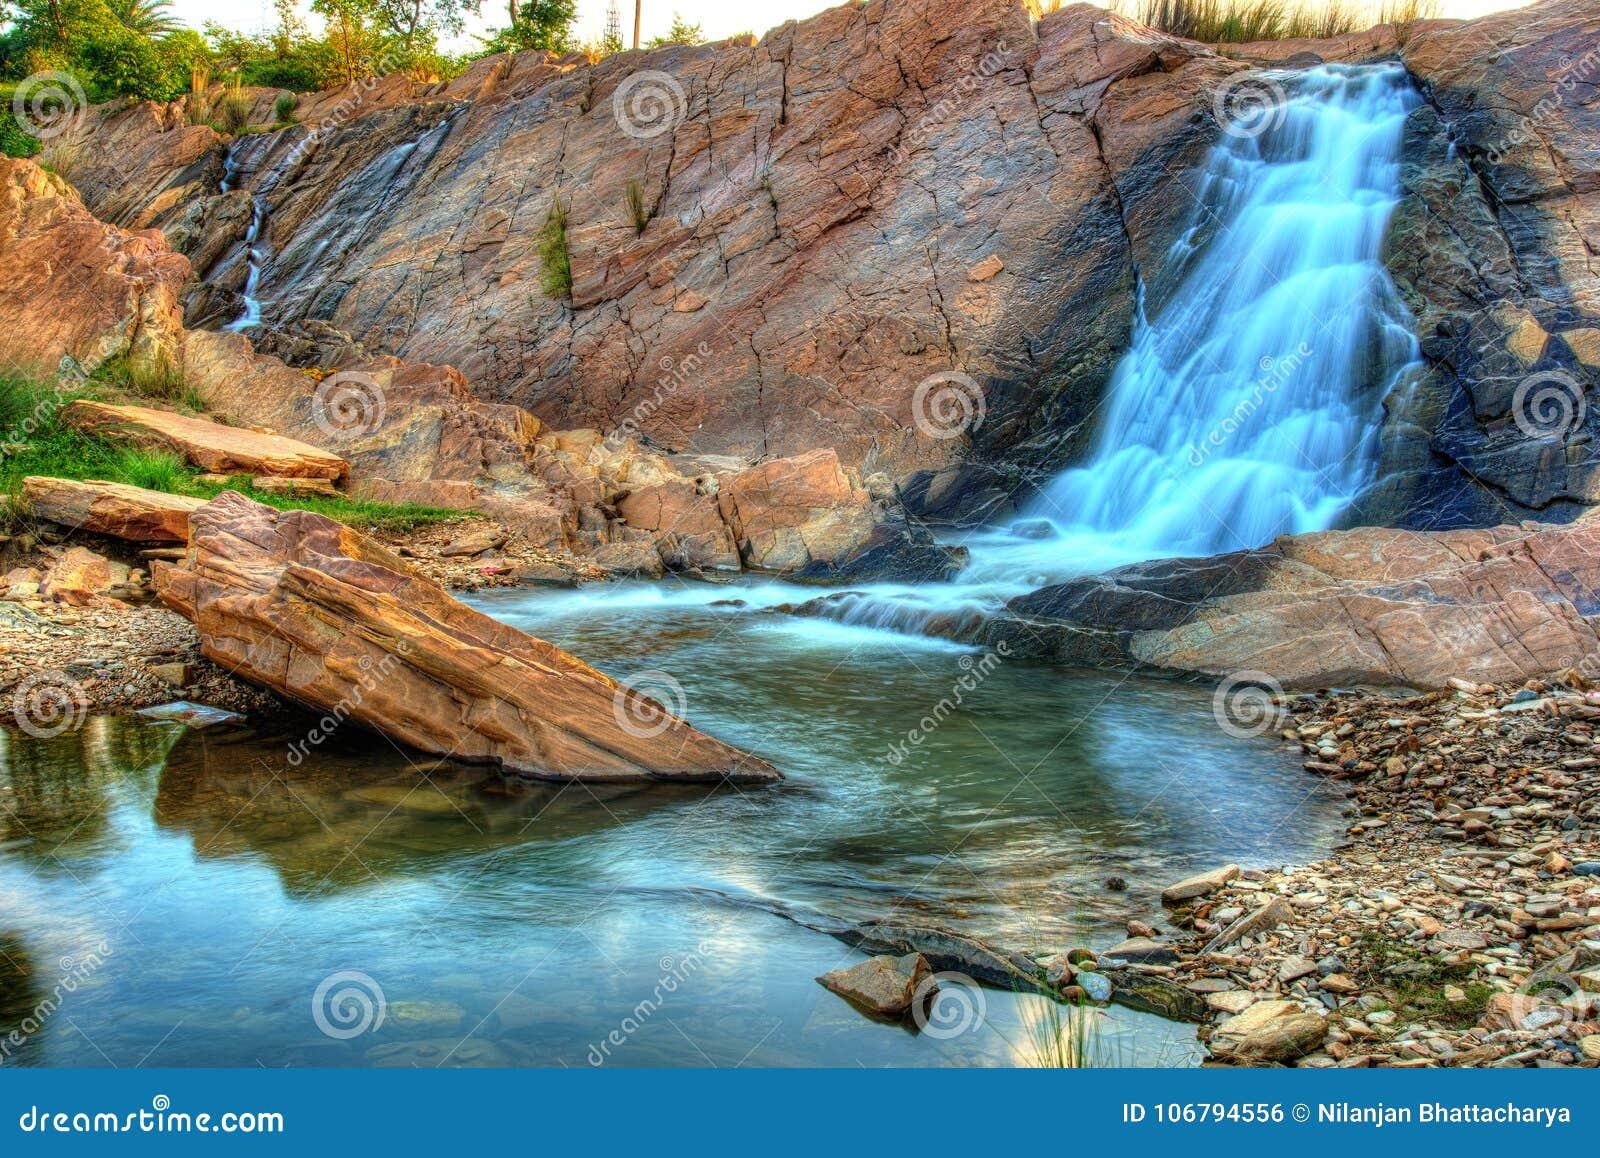 Ghatsila falls